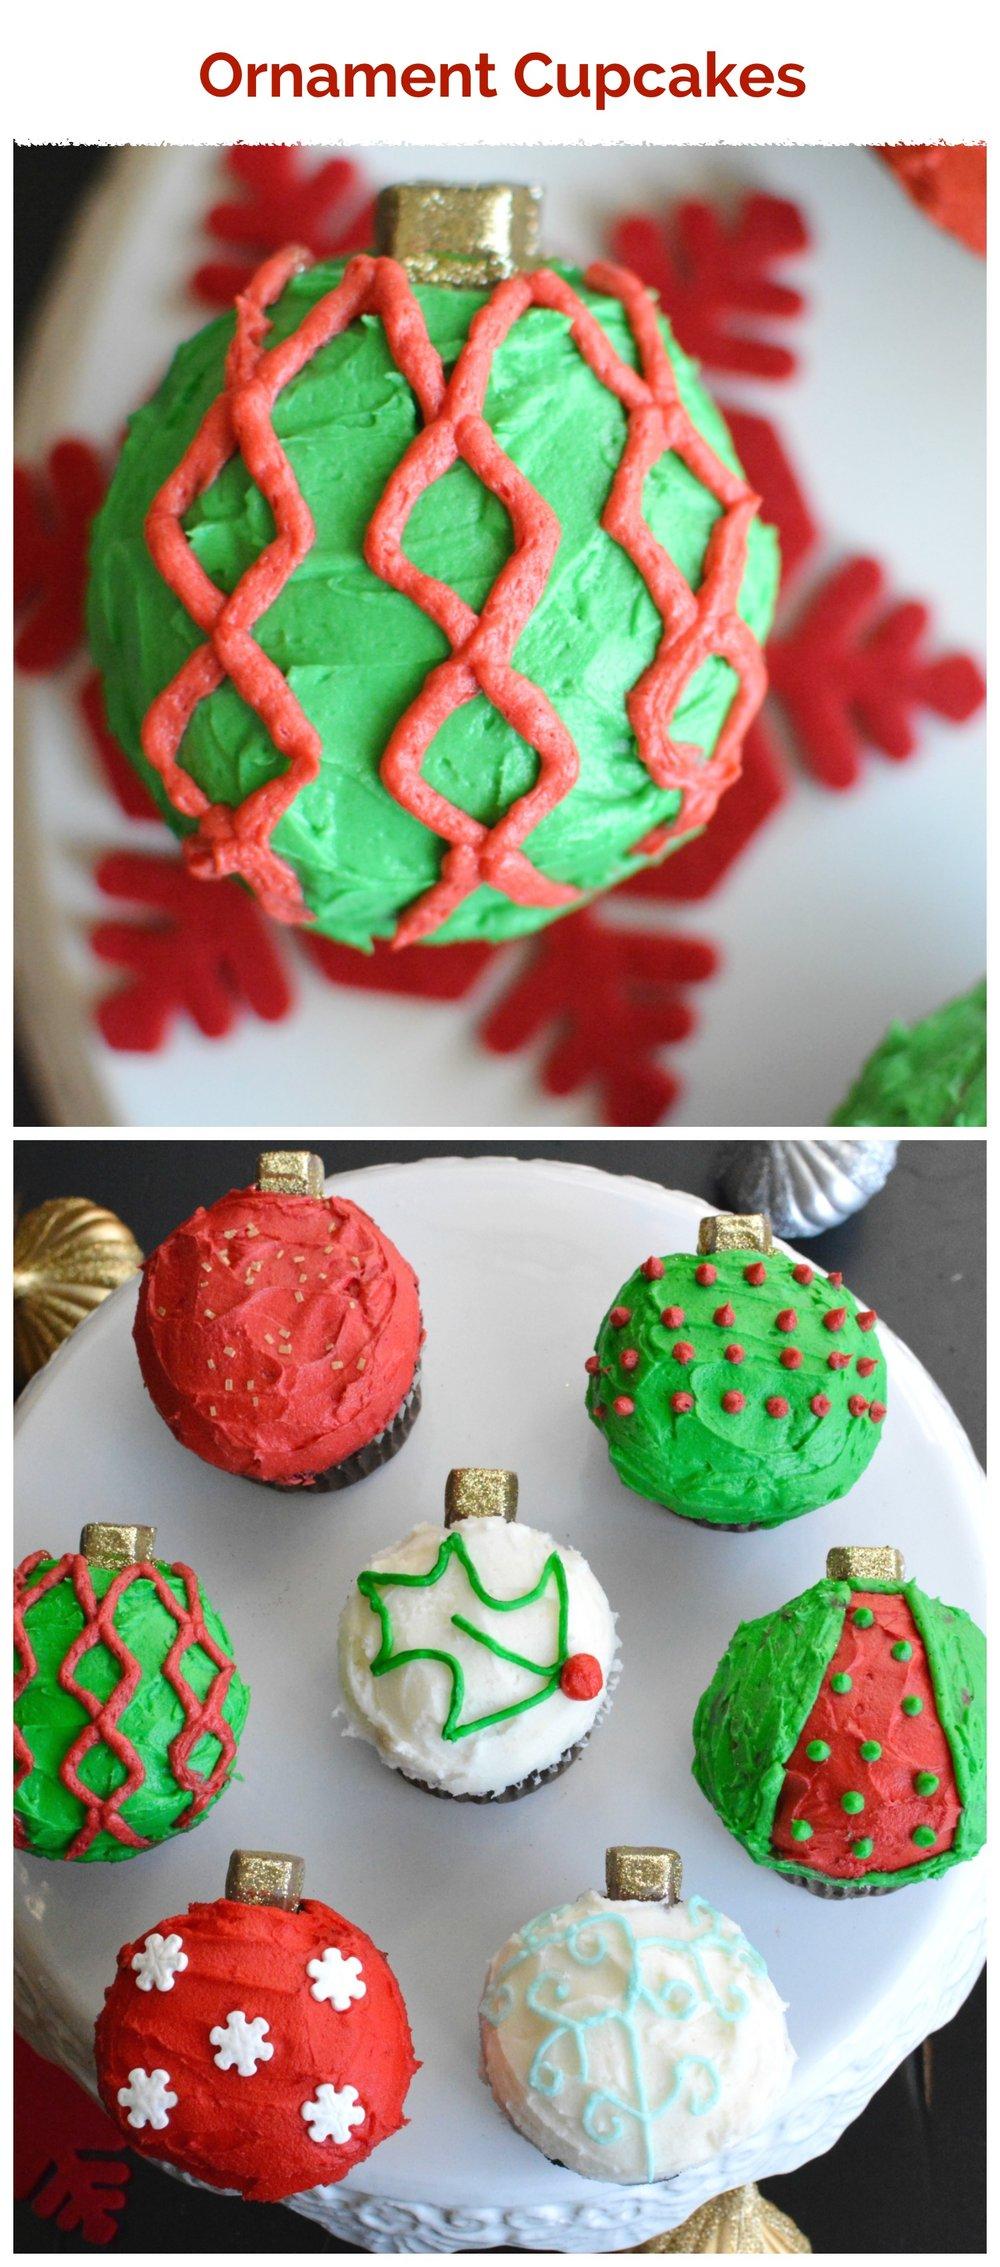 ornamentcupcakes.jpg